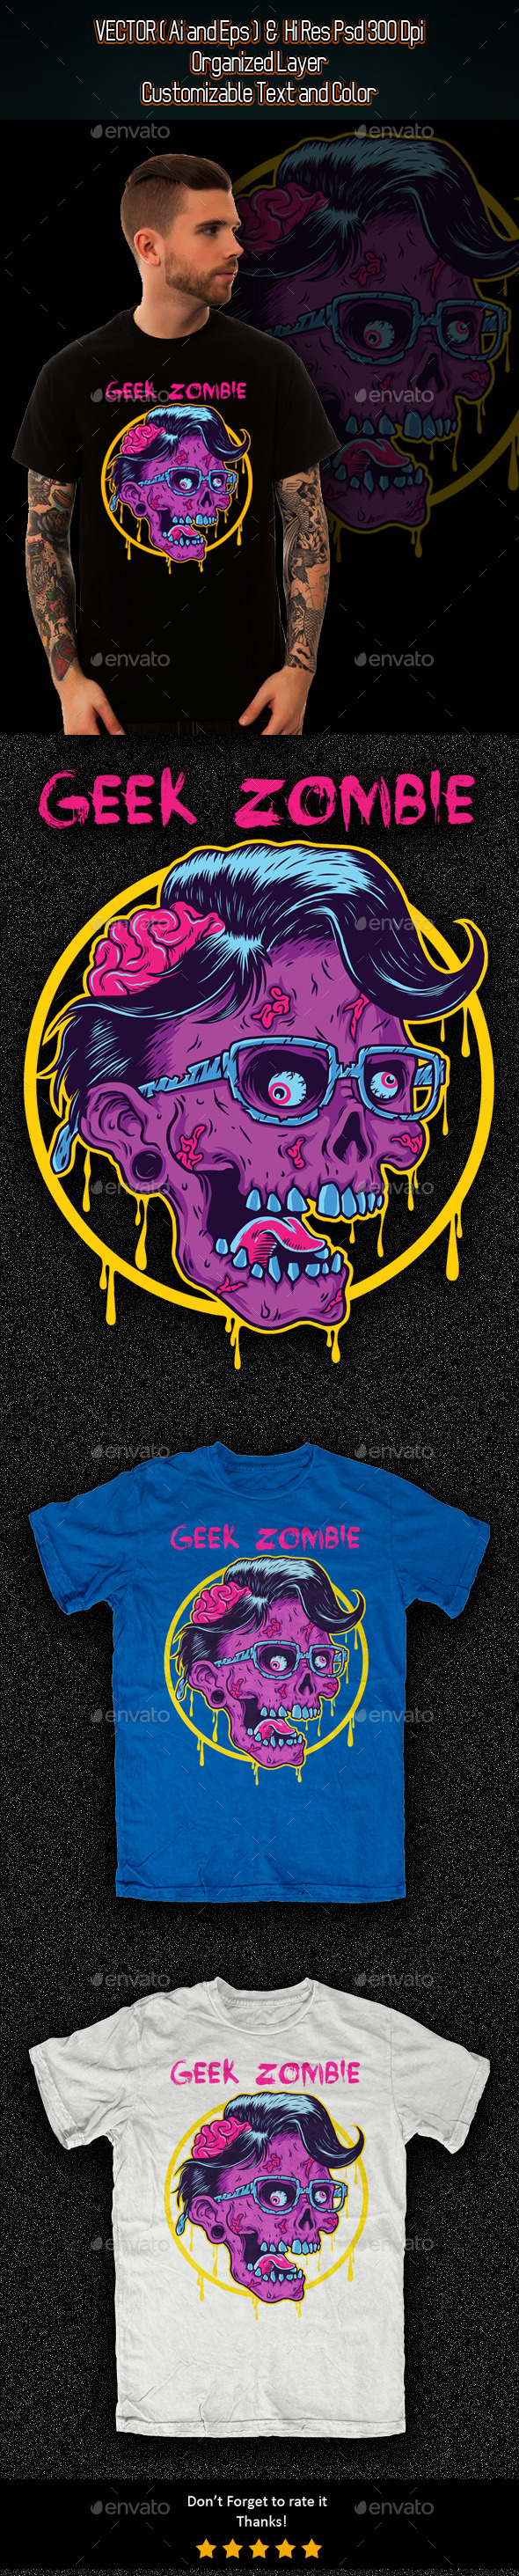 Geek Zombie - Funny Designs